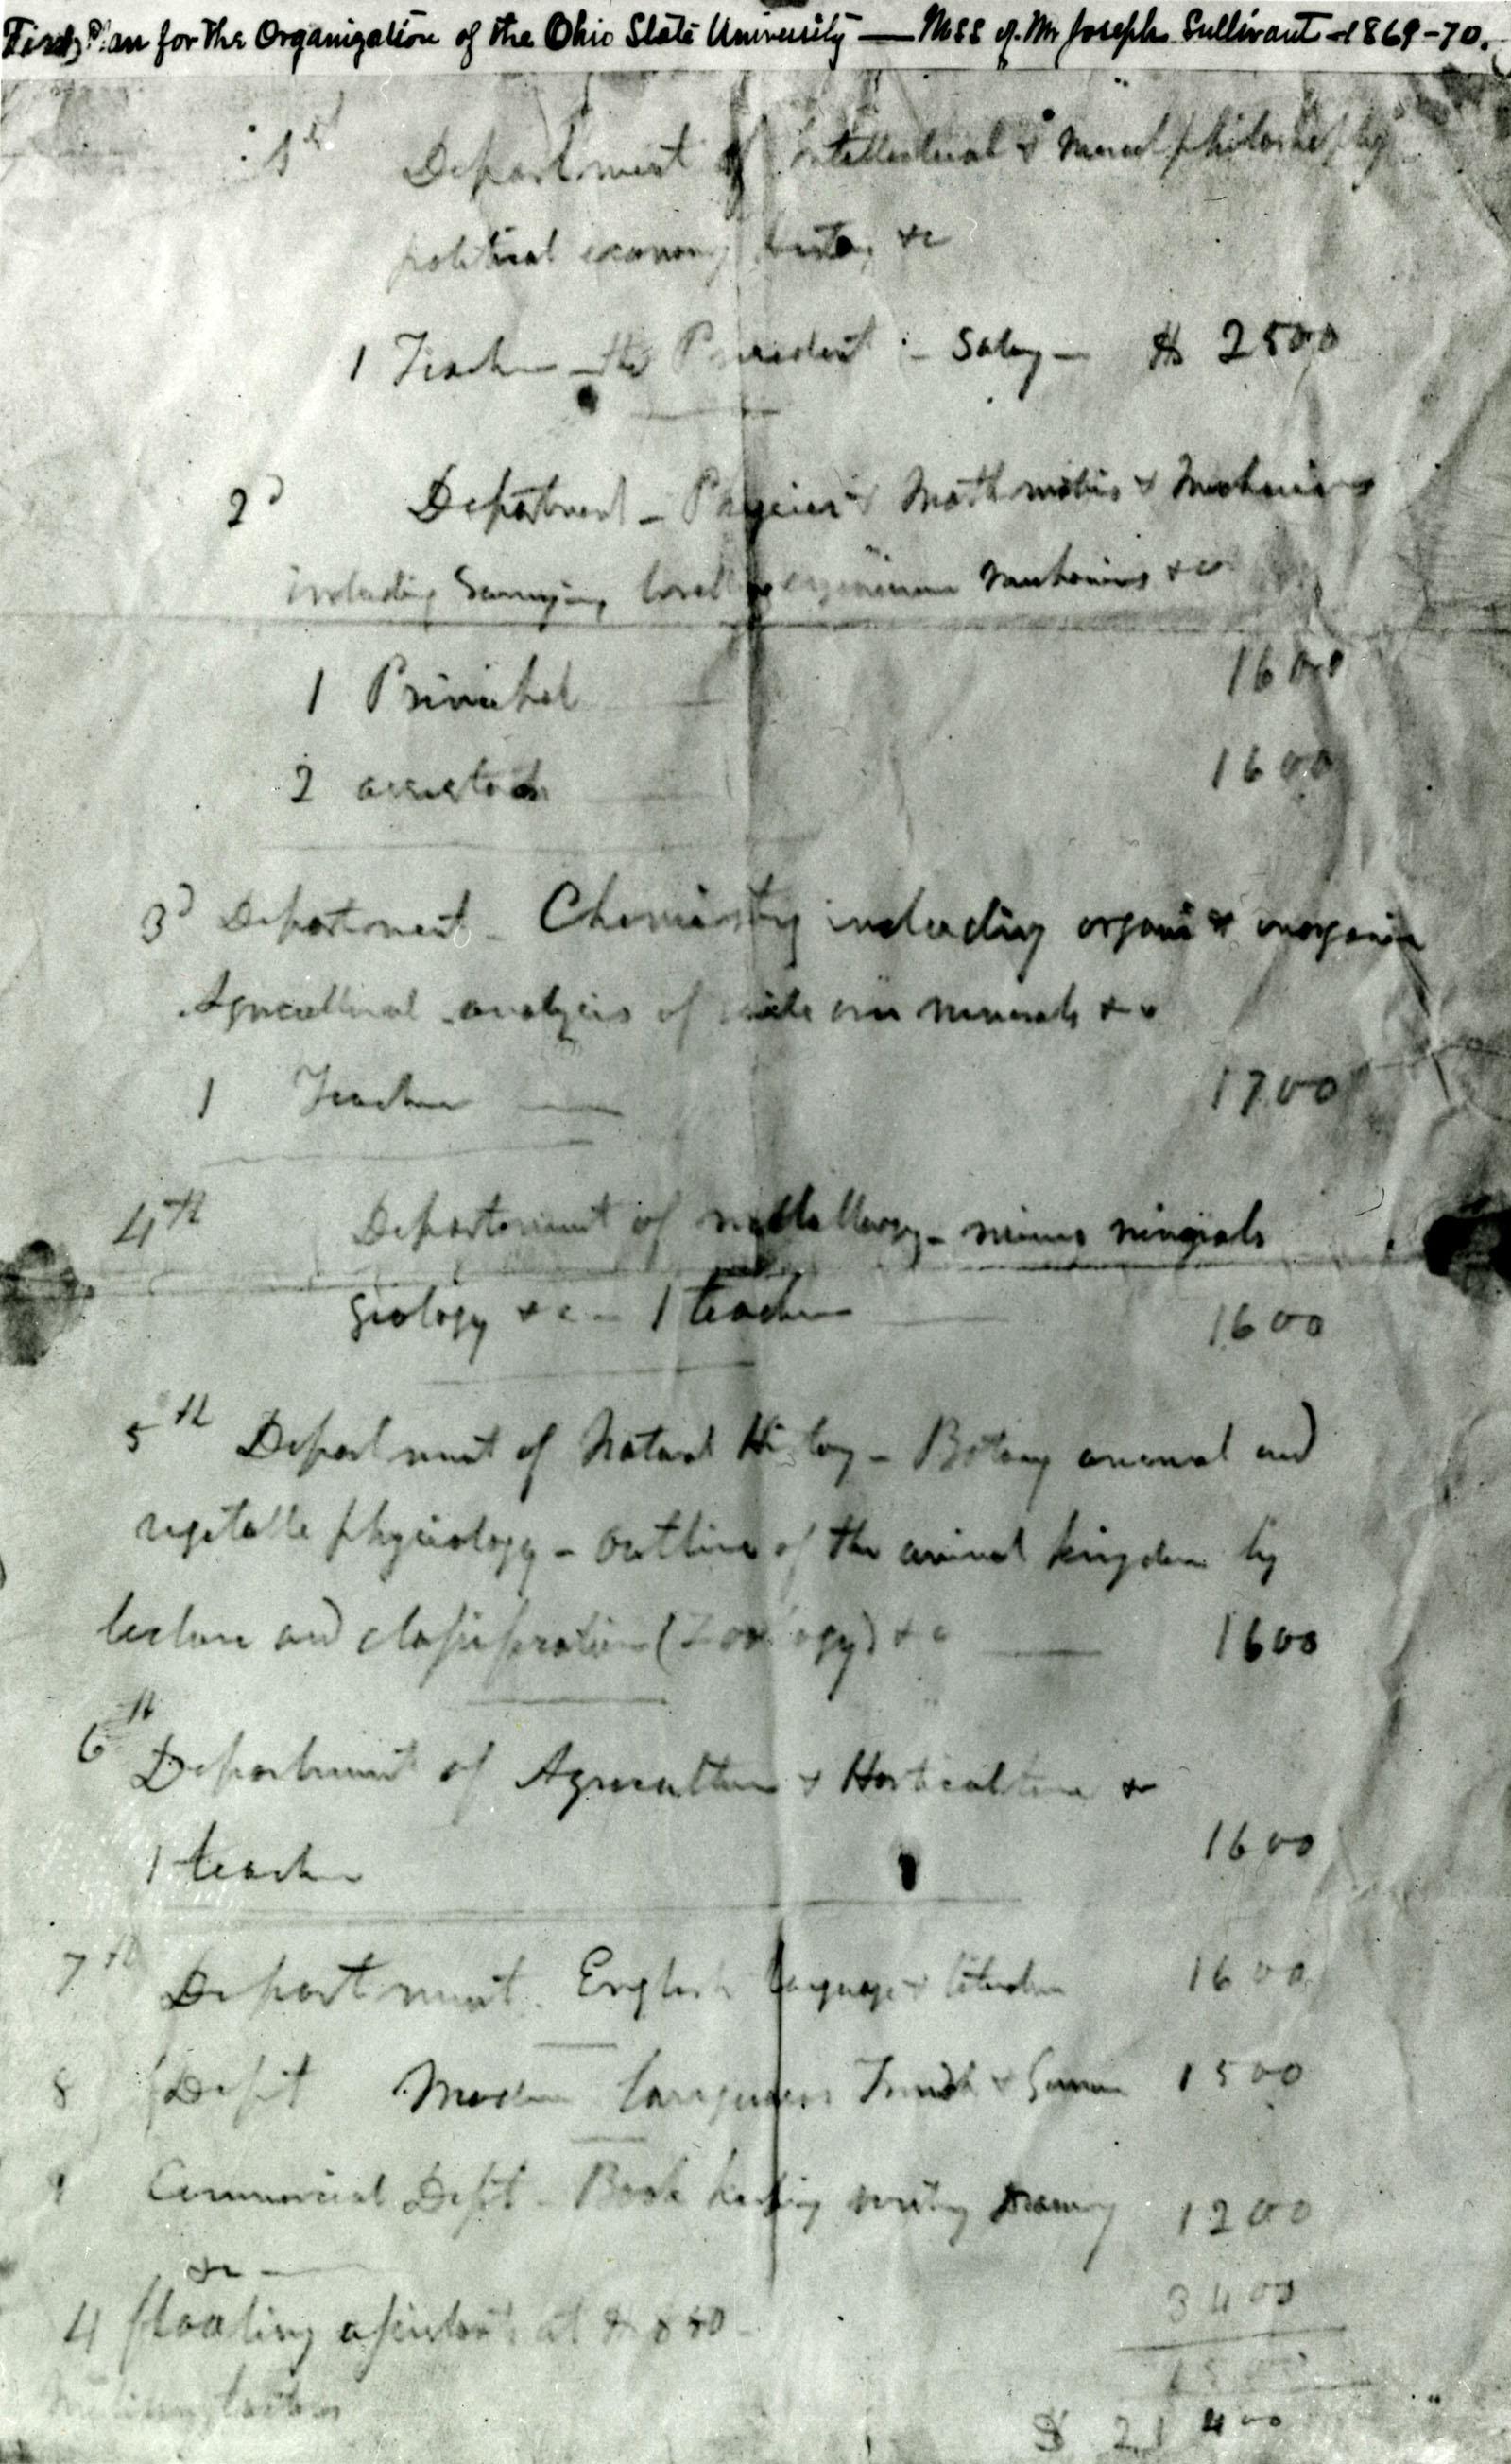 Sullivan's plan of organization for the school, 1869